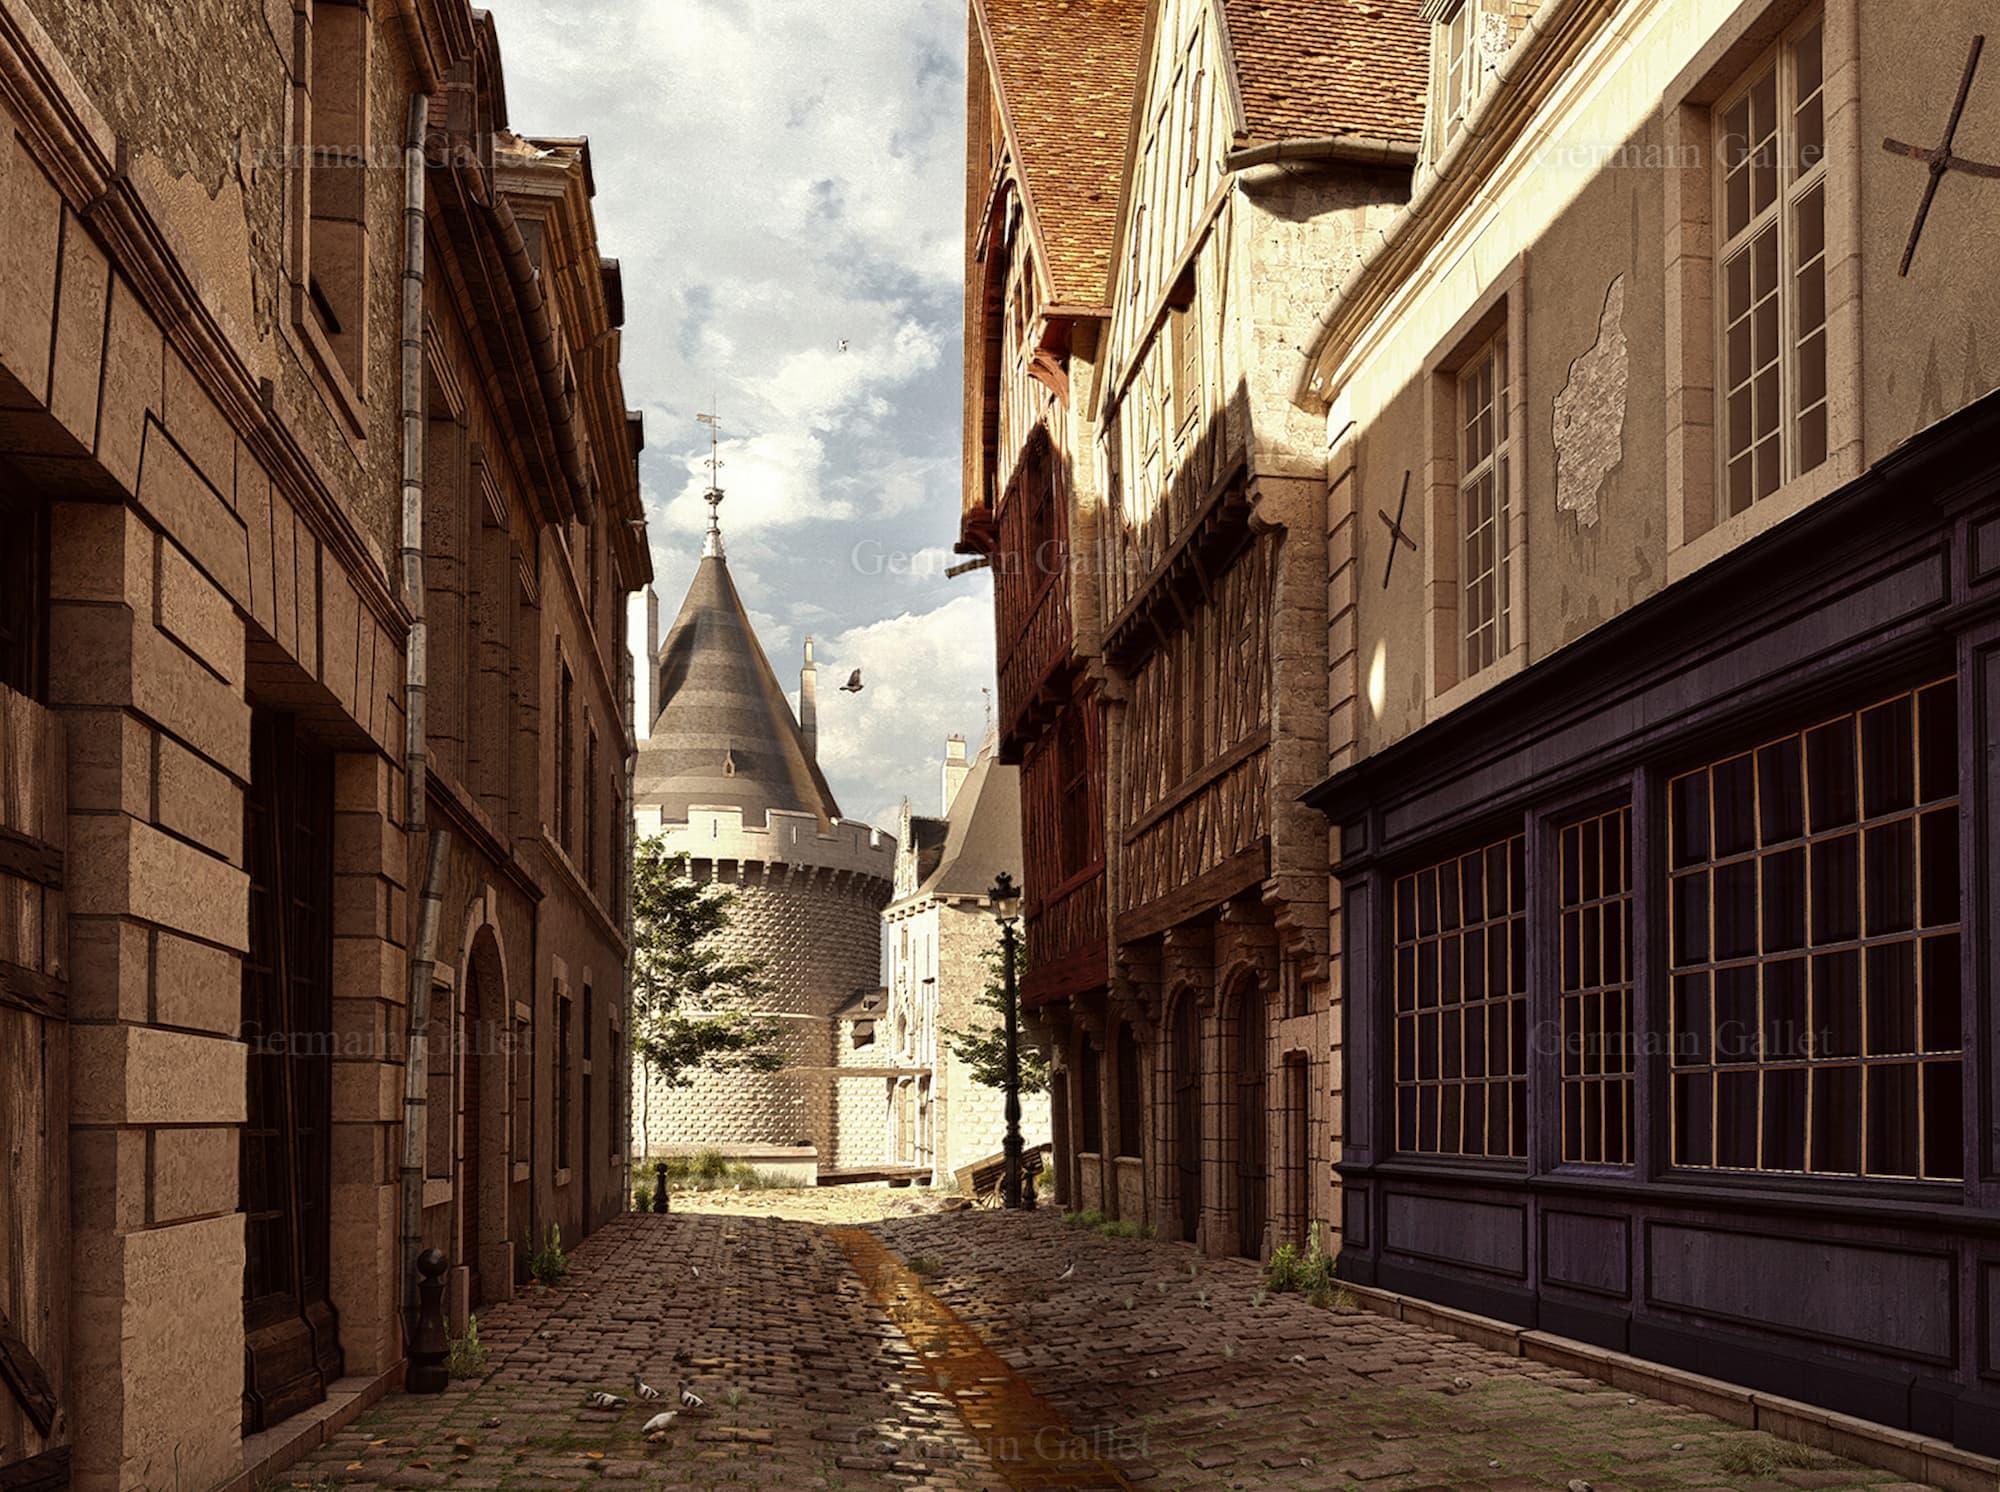 Château de Dijon, © Germain Gallet